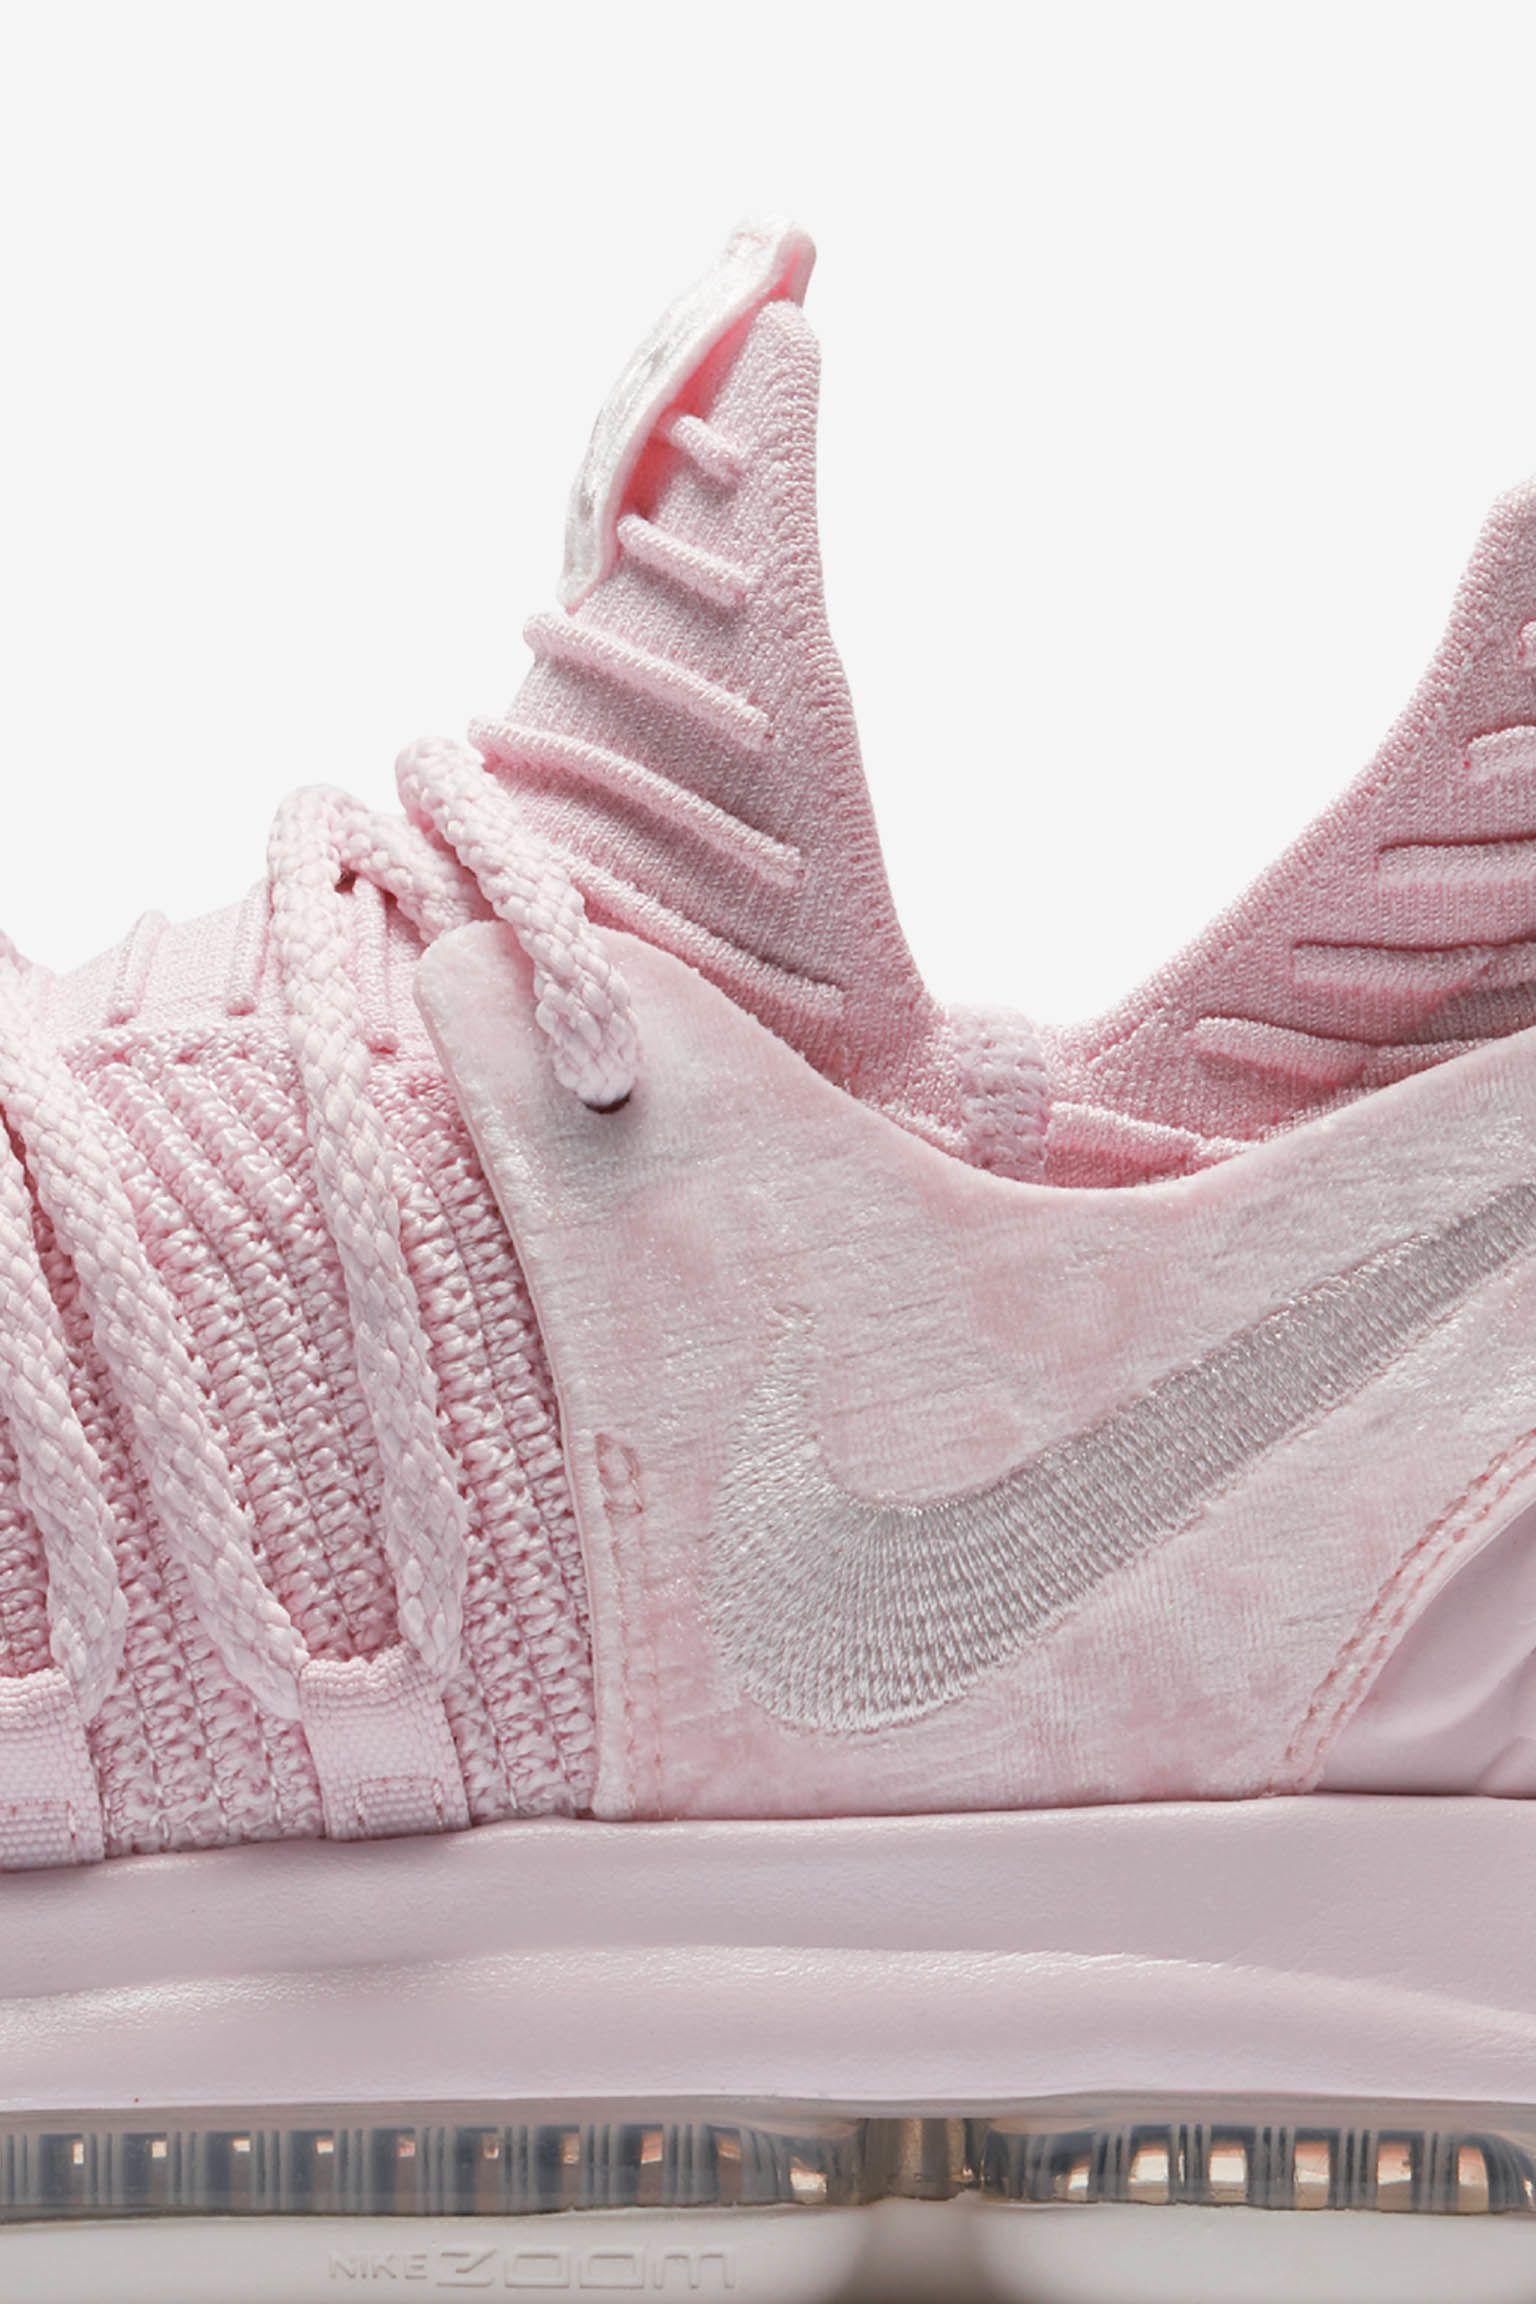 Nike KDX 'Aunt Pearl' Release Date